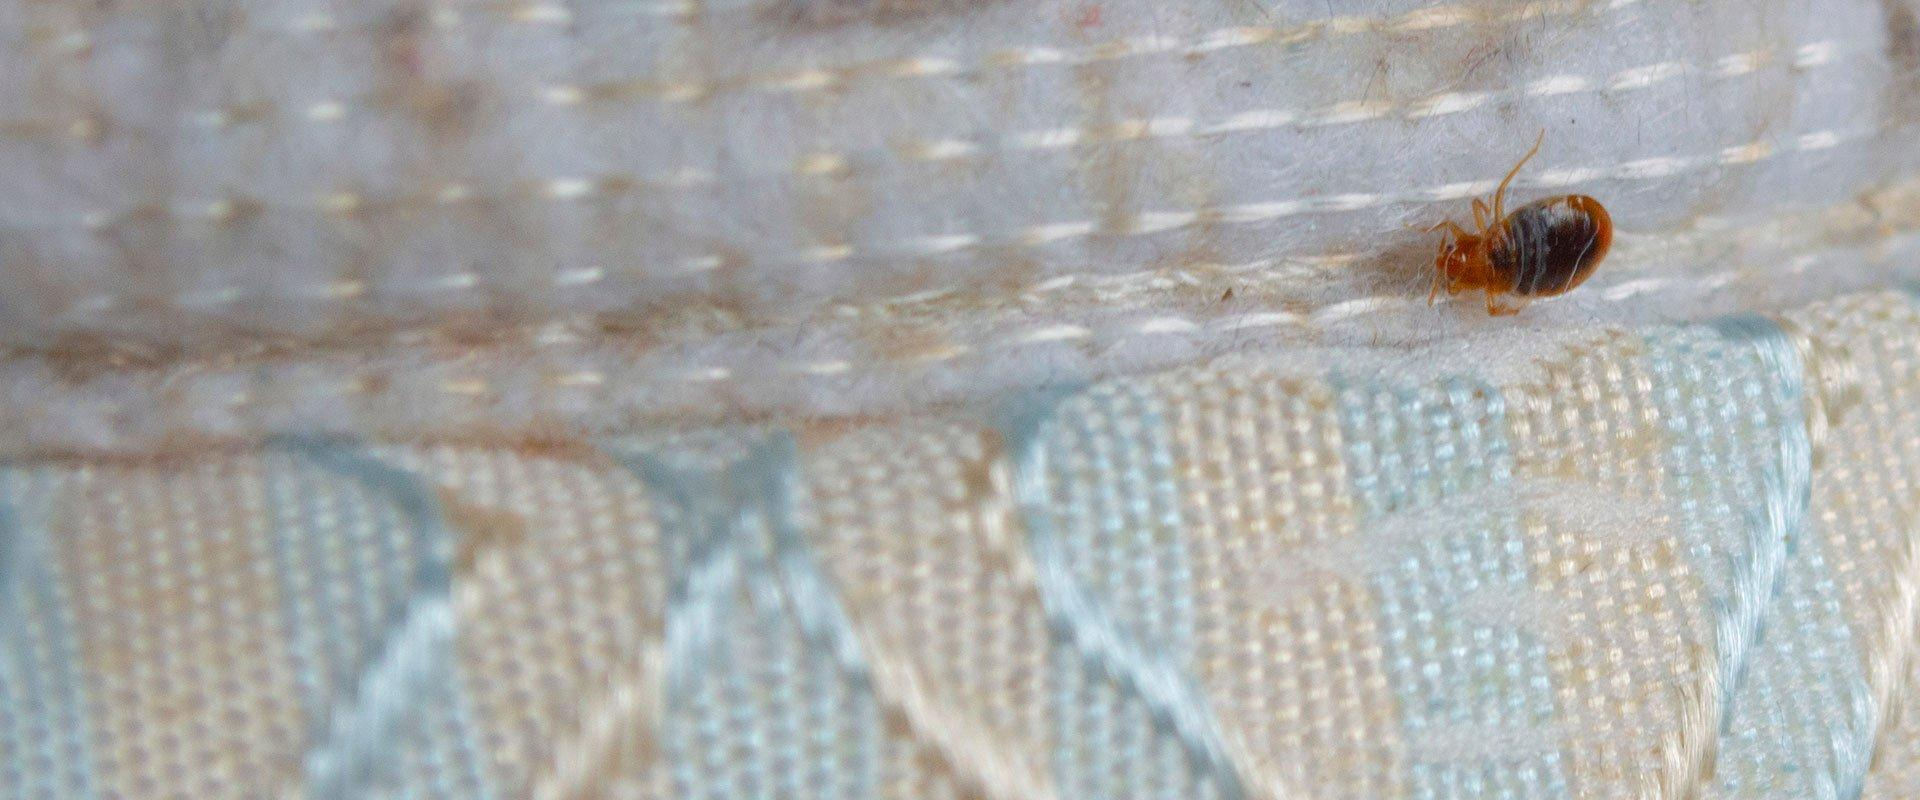 bed bug on a mattress